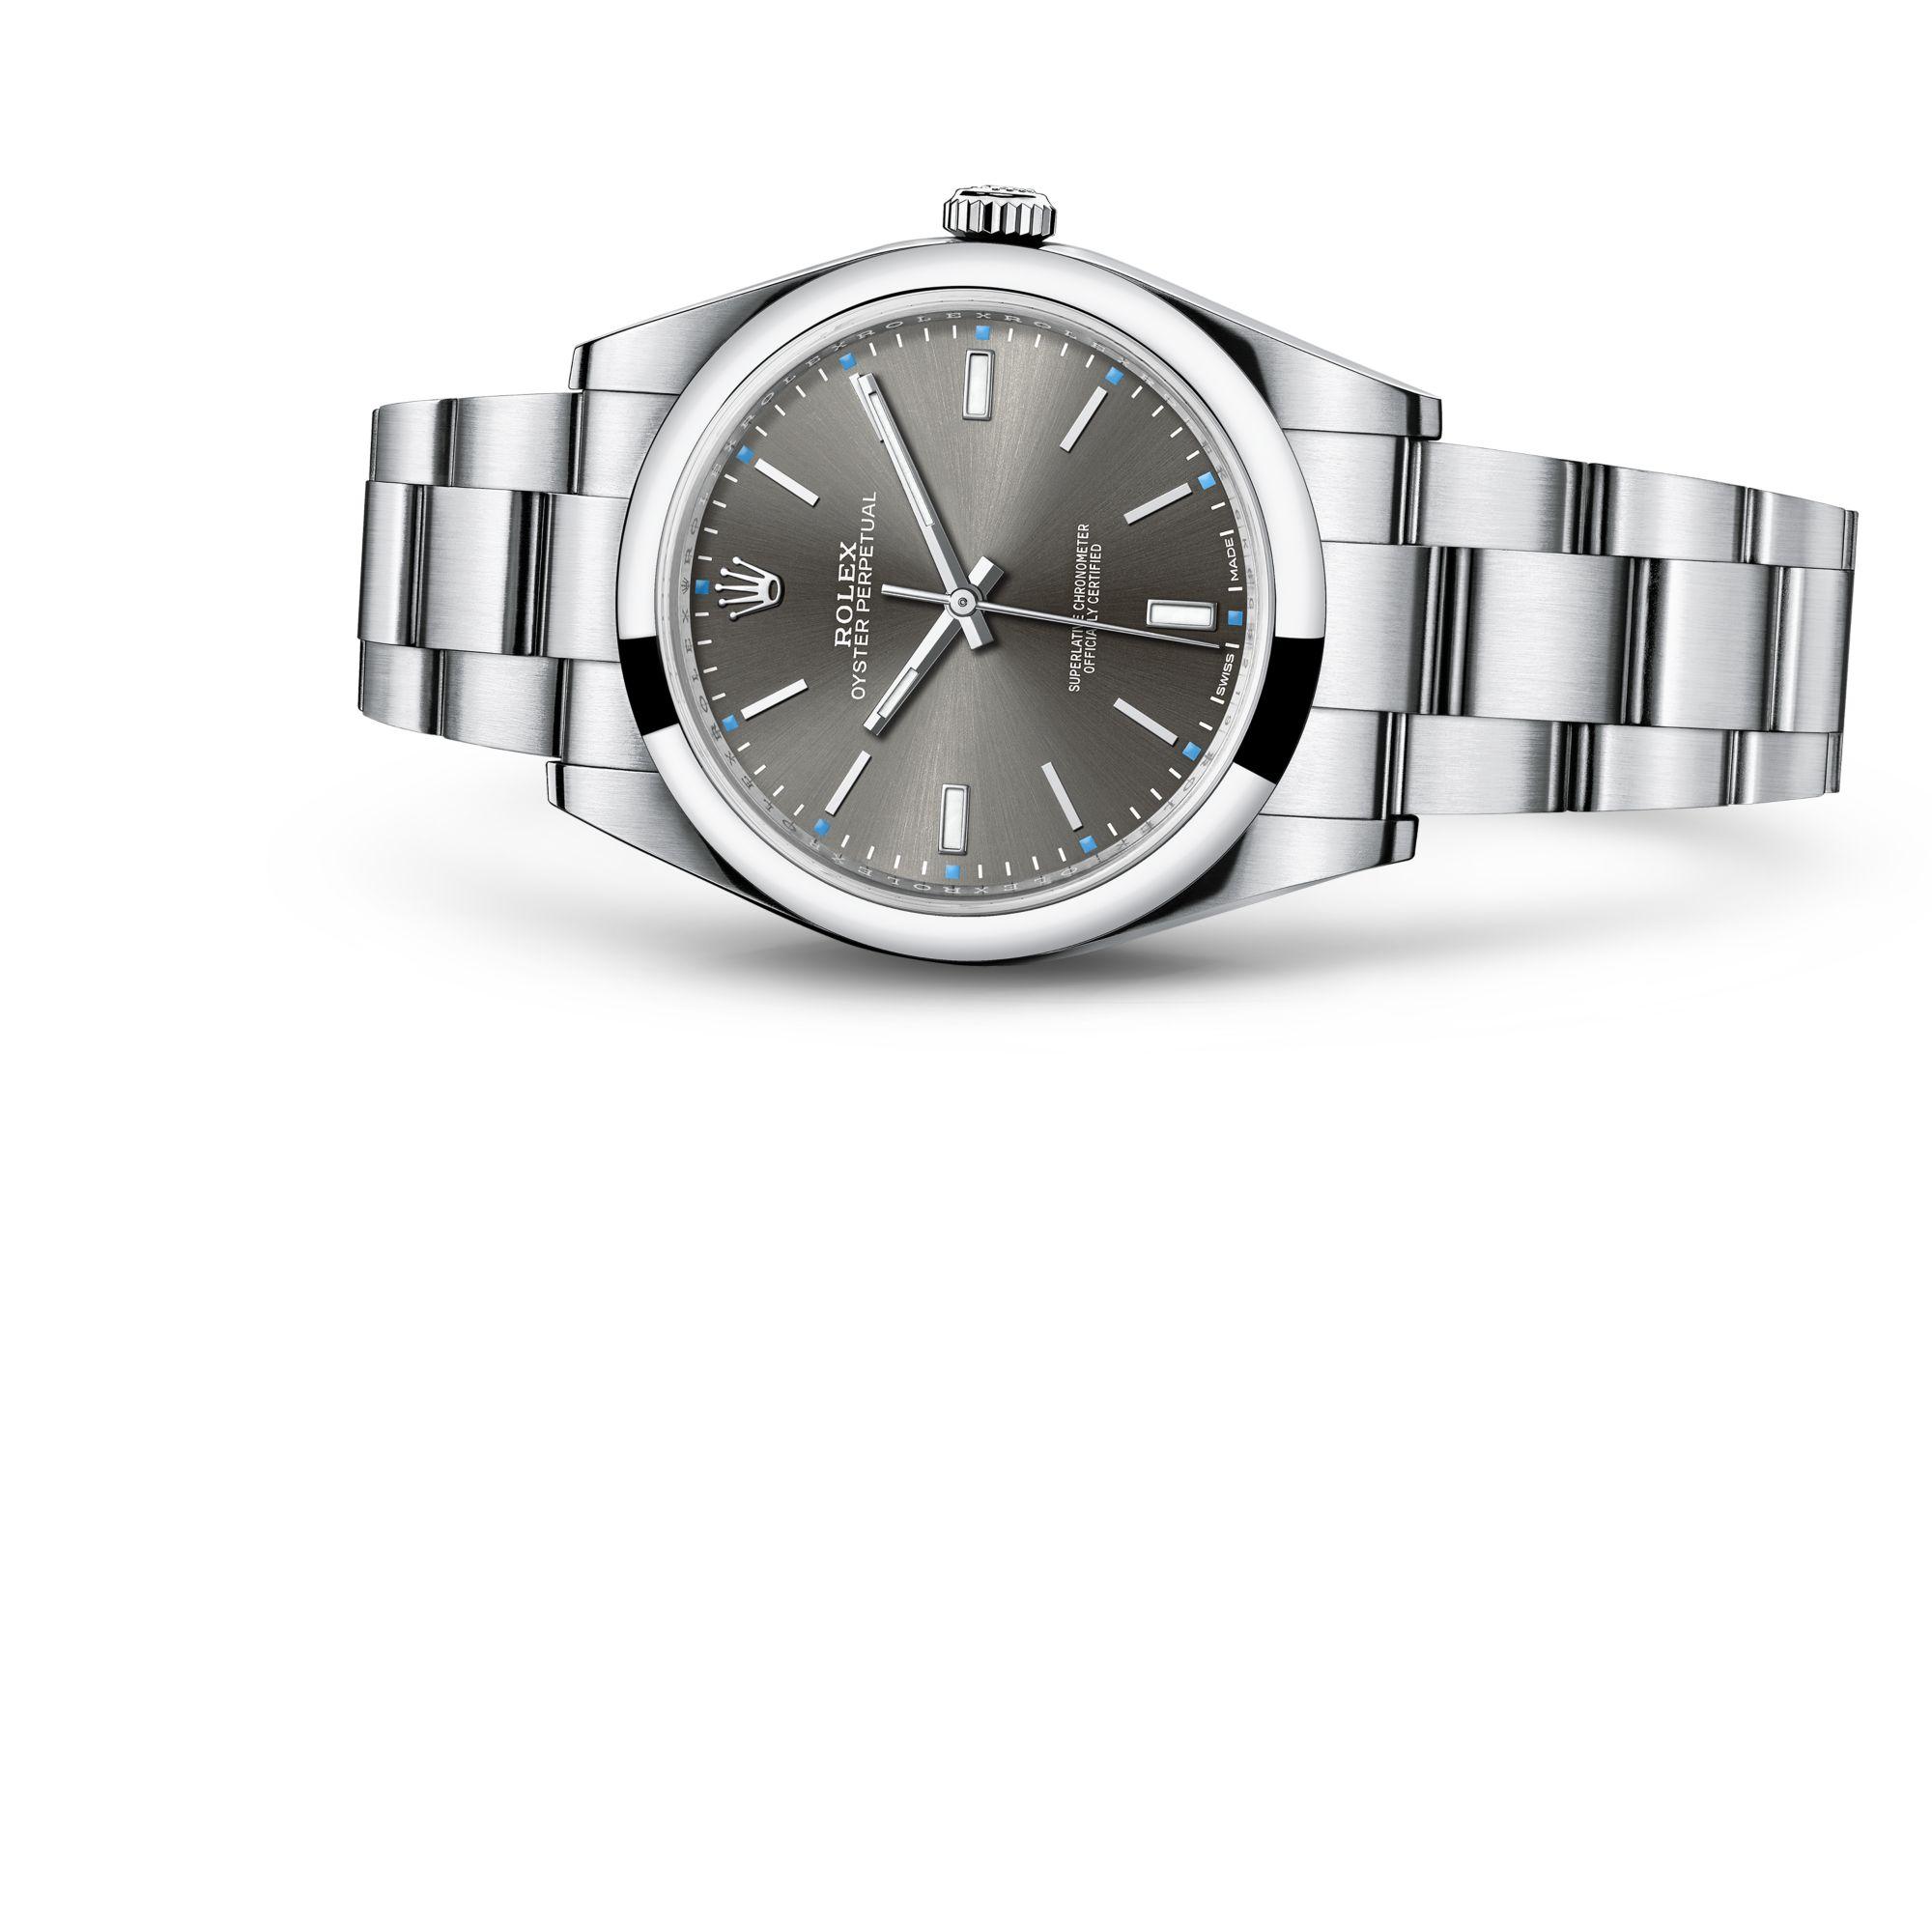 Rolex أويستر بربتشوال ٣٩ M114300-0001